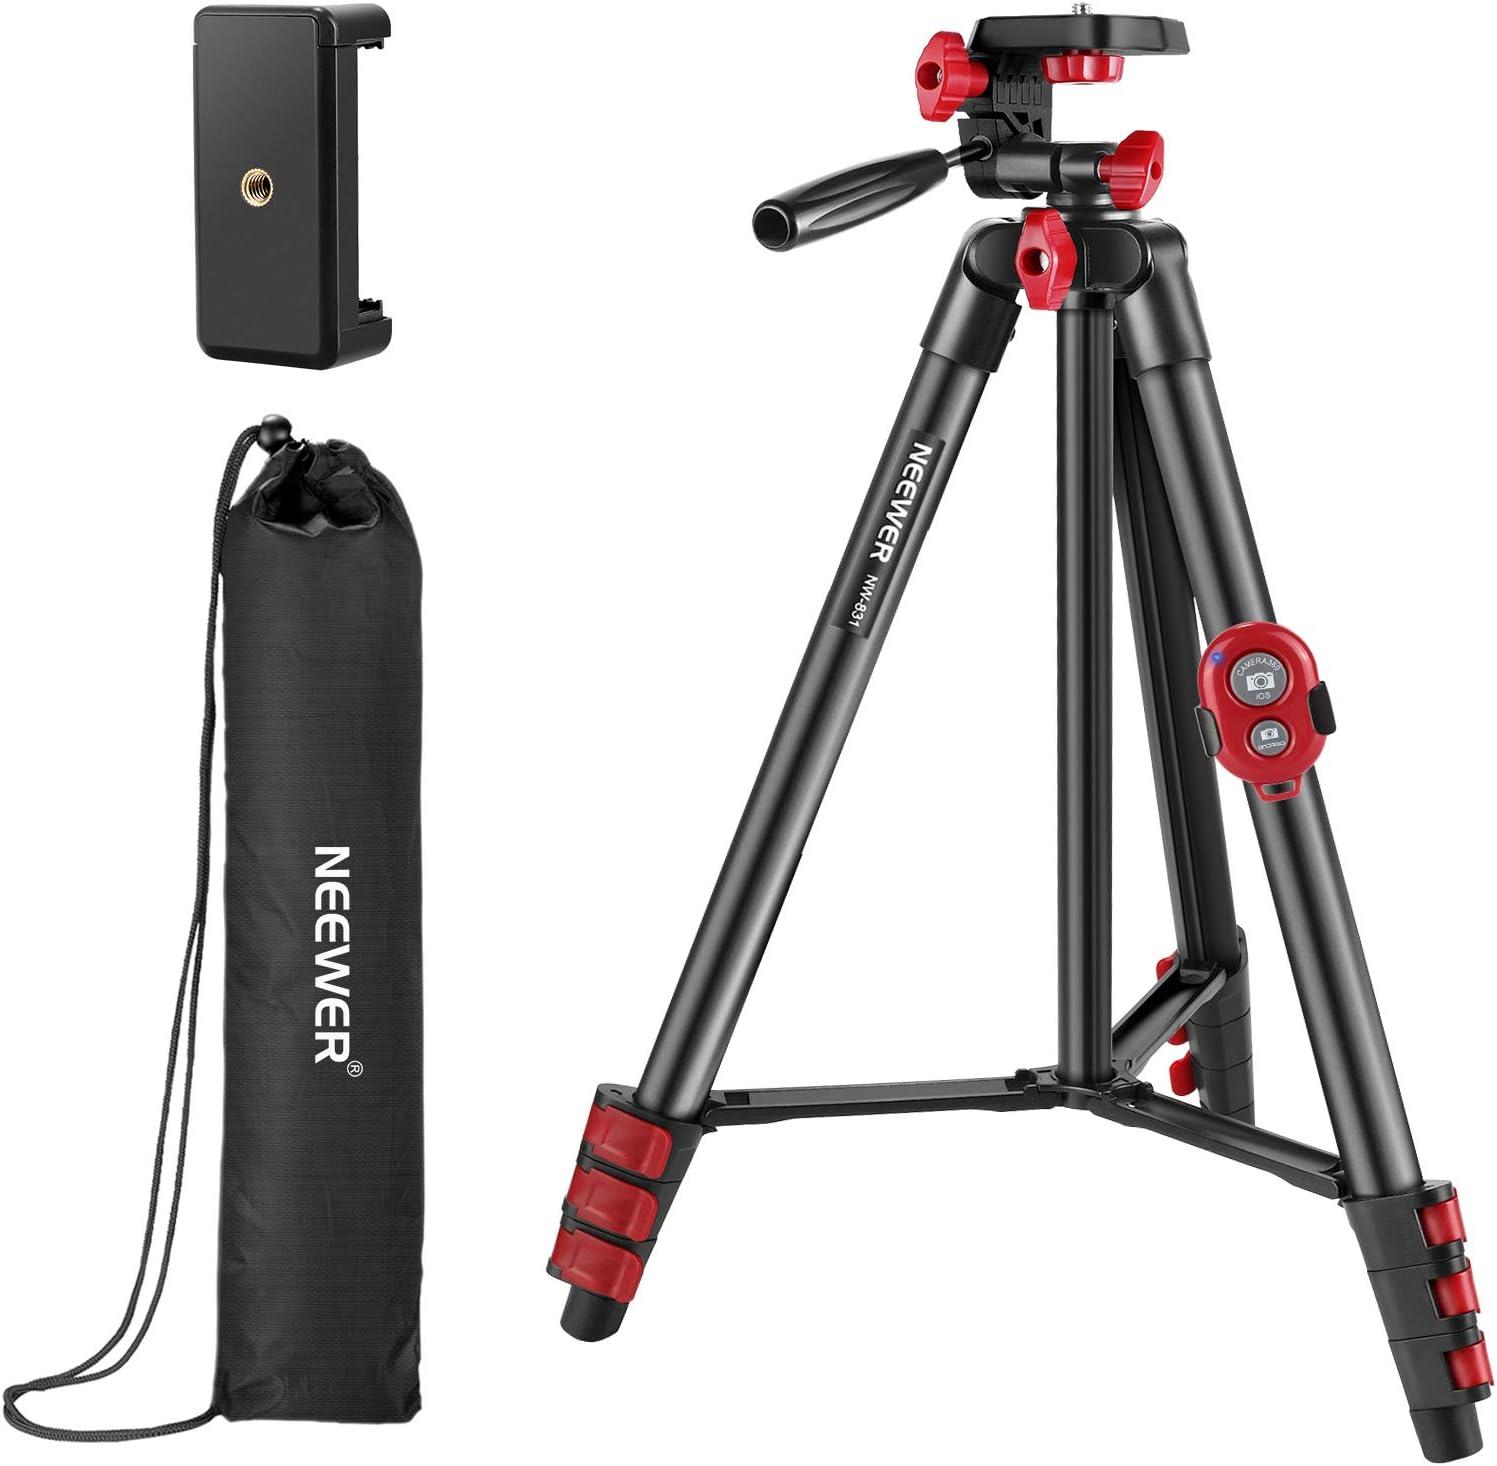 Neewer Tripod Kit 54 Zoll Reisestativ Mit Pan Head Kamera